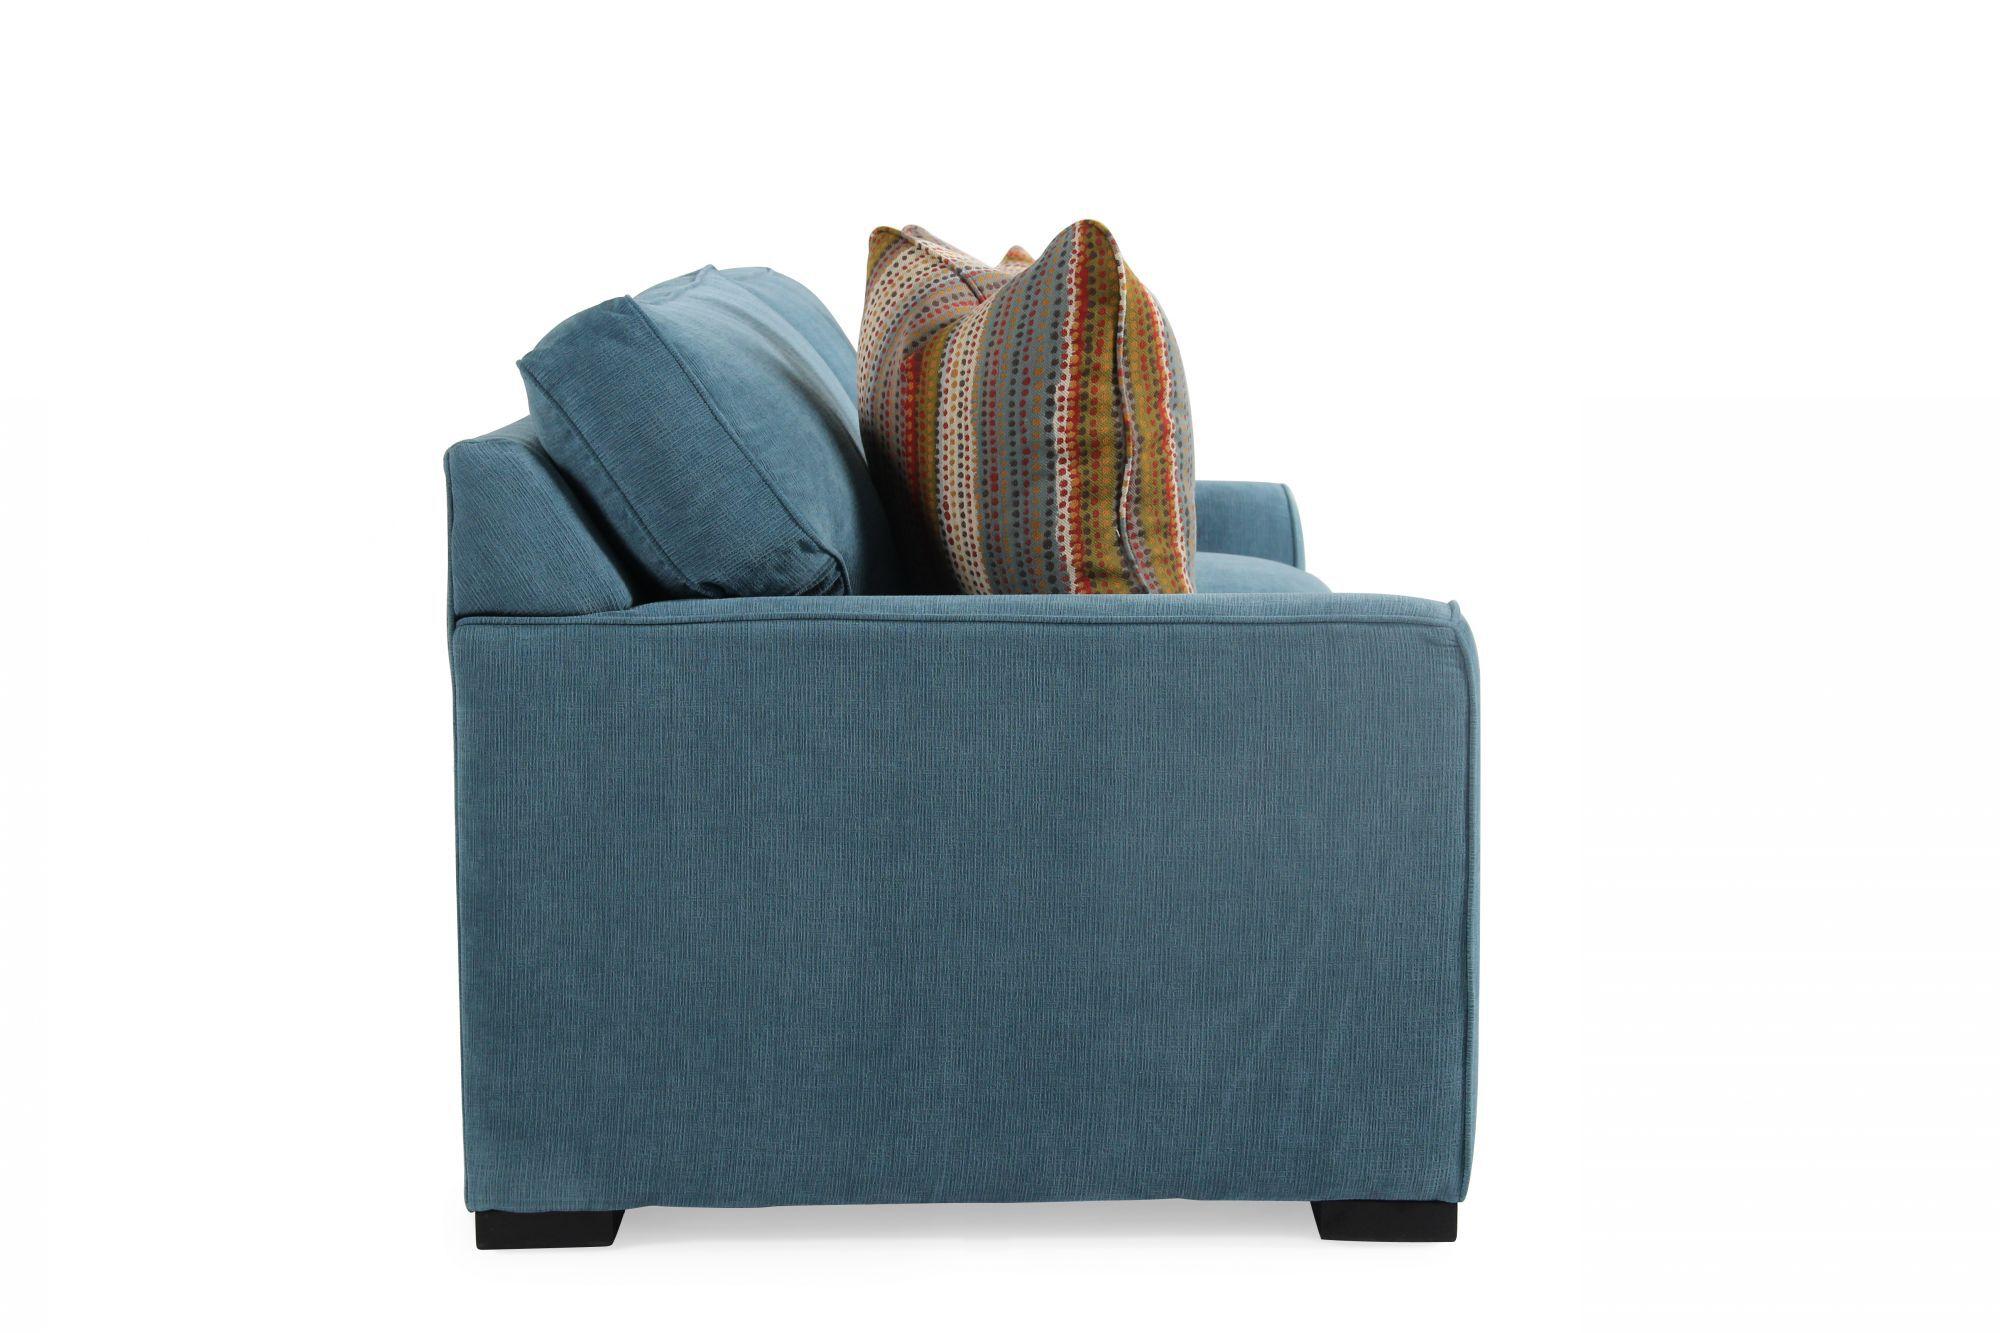 sh memory foam sleeper sofa mattress what type of leather is best for sofas jonathan louis blissful blue full